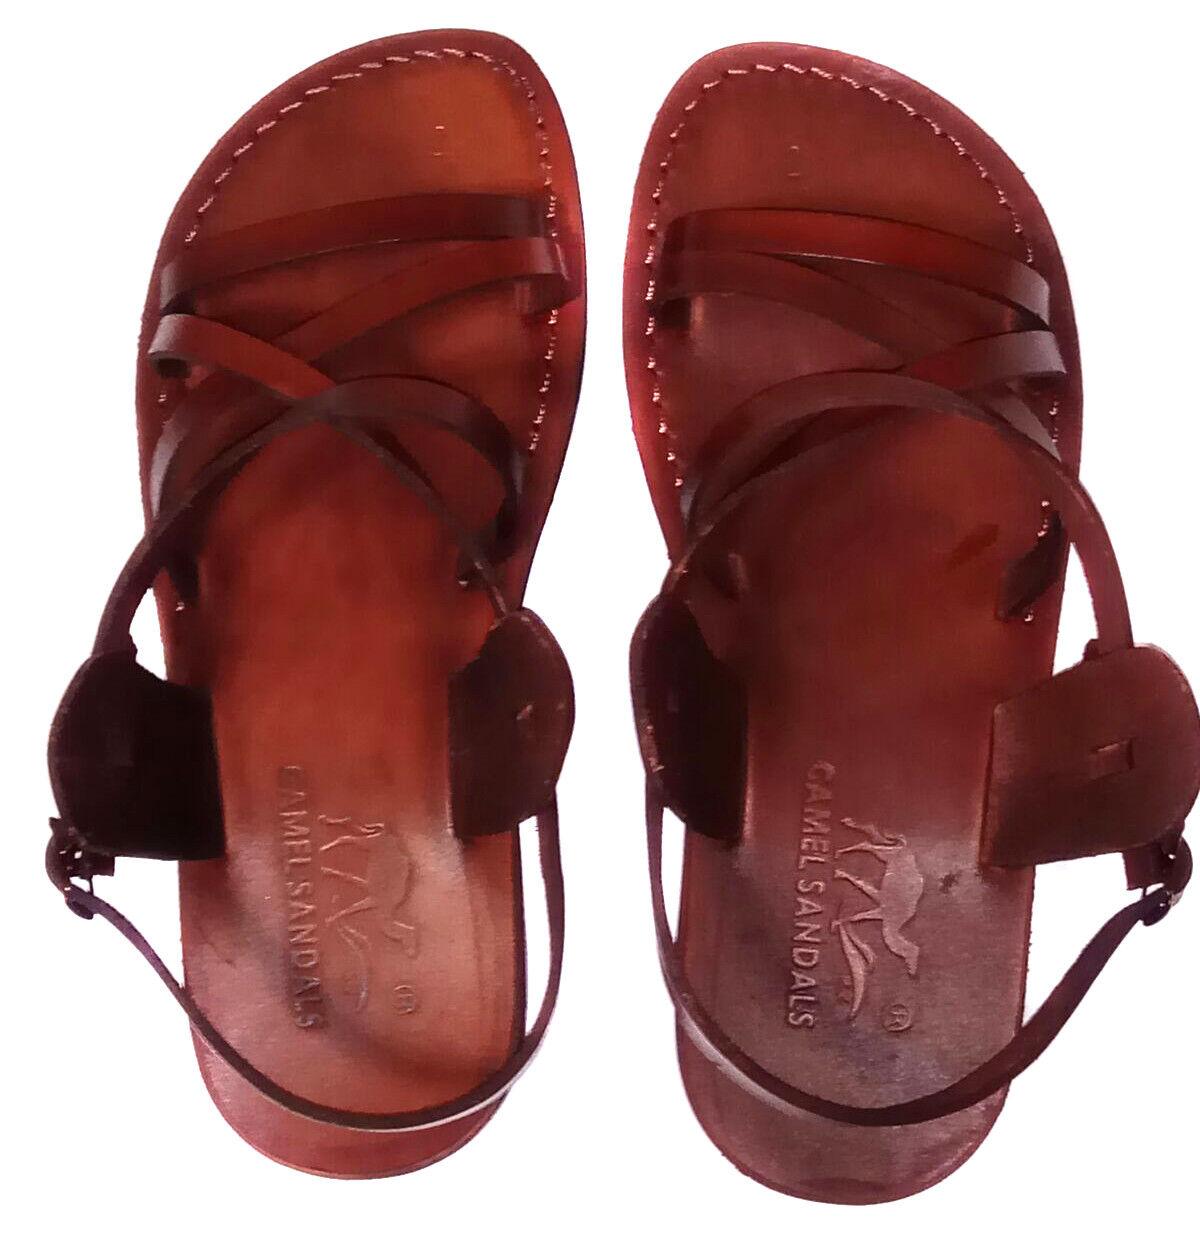 Brown Leather Roman Gladiator Jesus Sandals Strap Handmade Size UK 4-11 EU 36-46